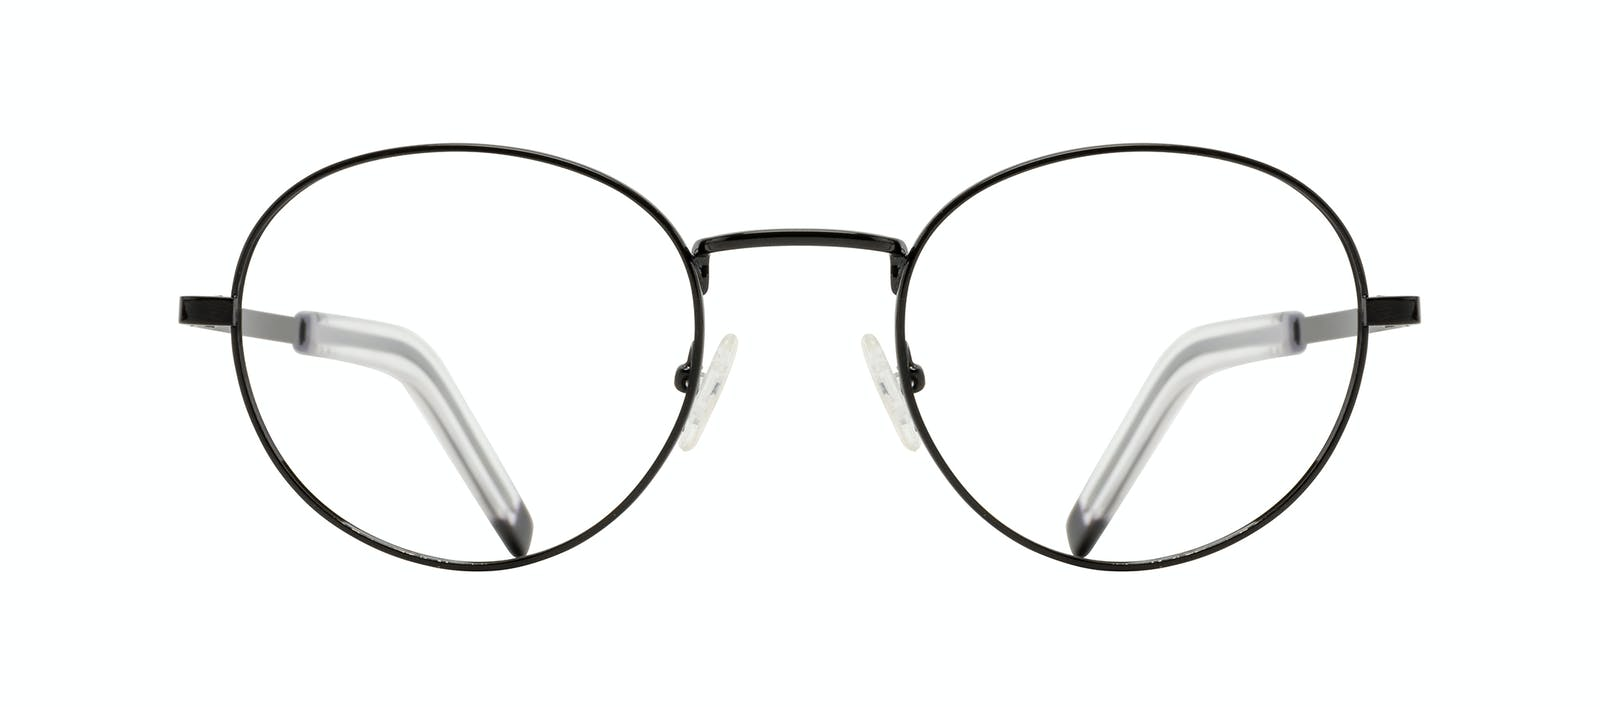 2b6dc6d7bf Affordable Fashion Glasses Round Eyeglasses Men Lean XL Black Front